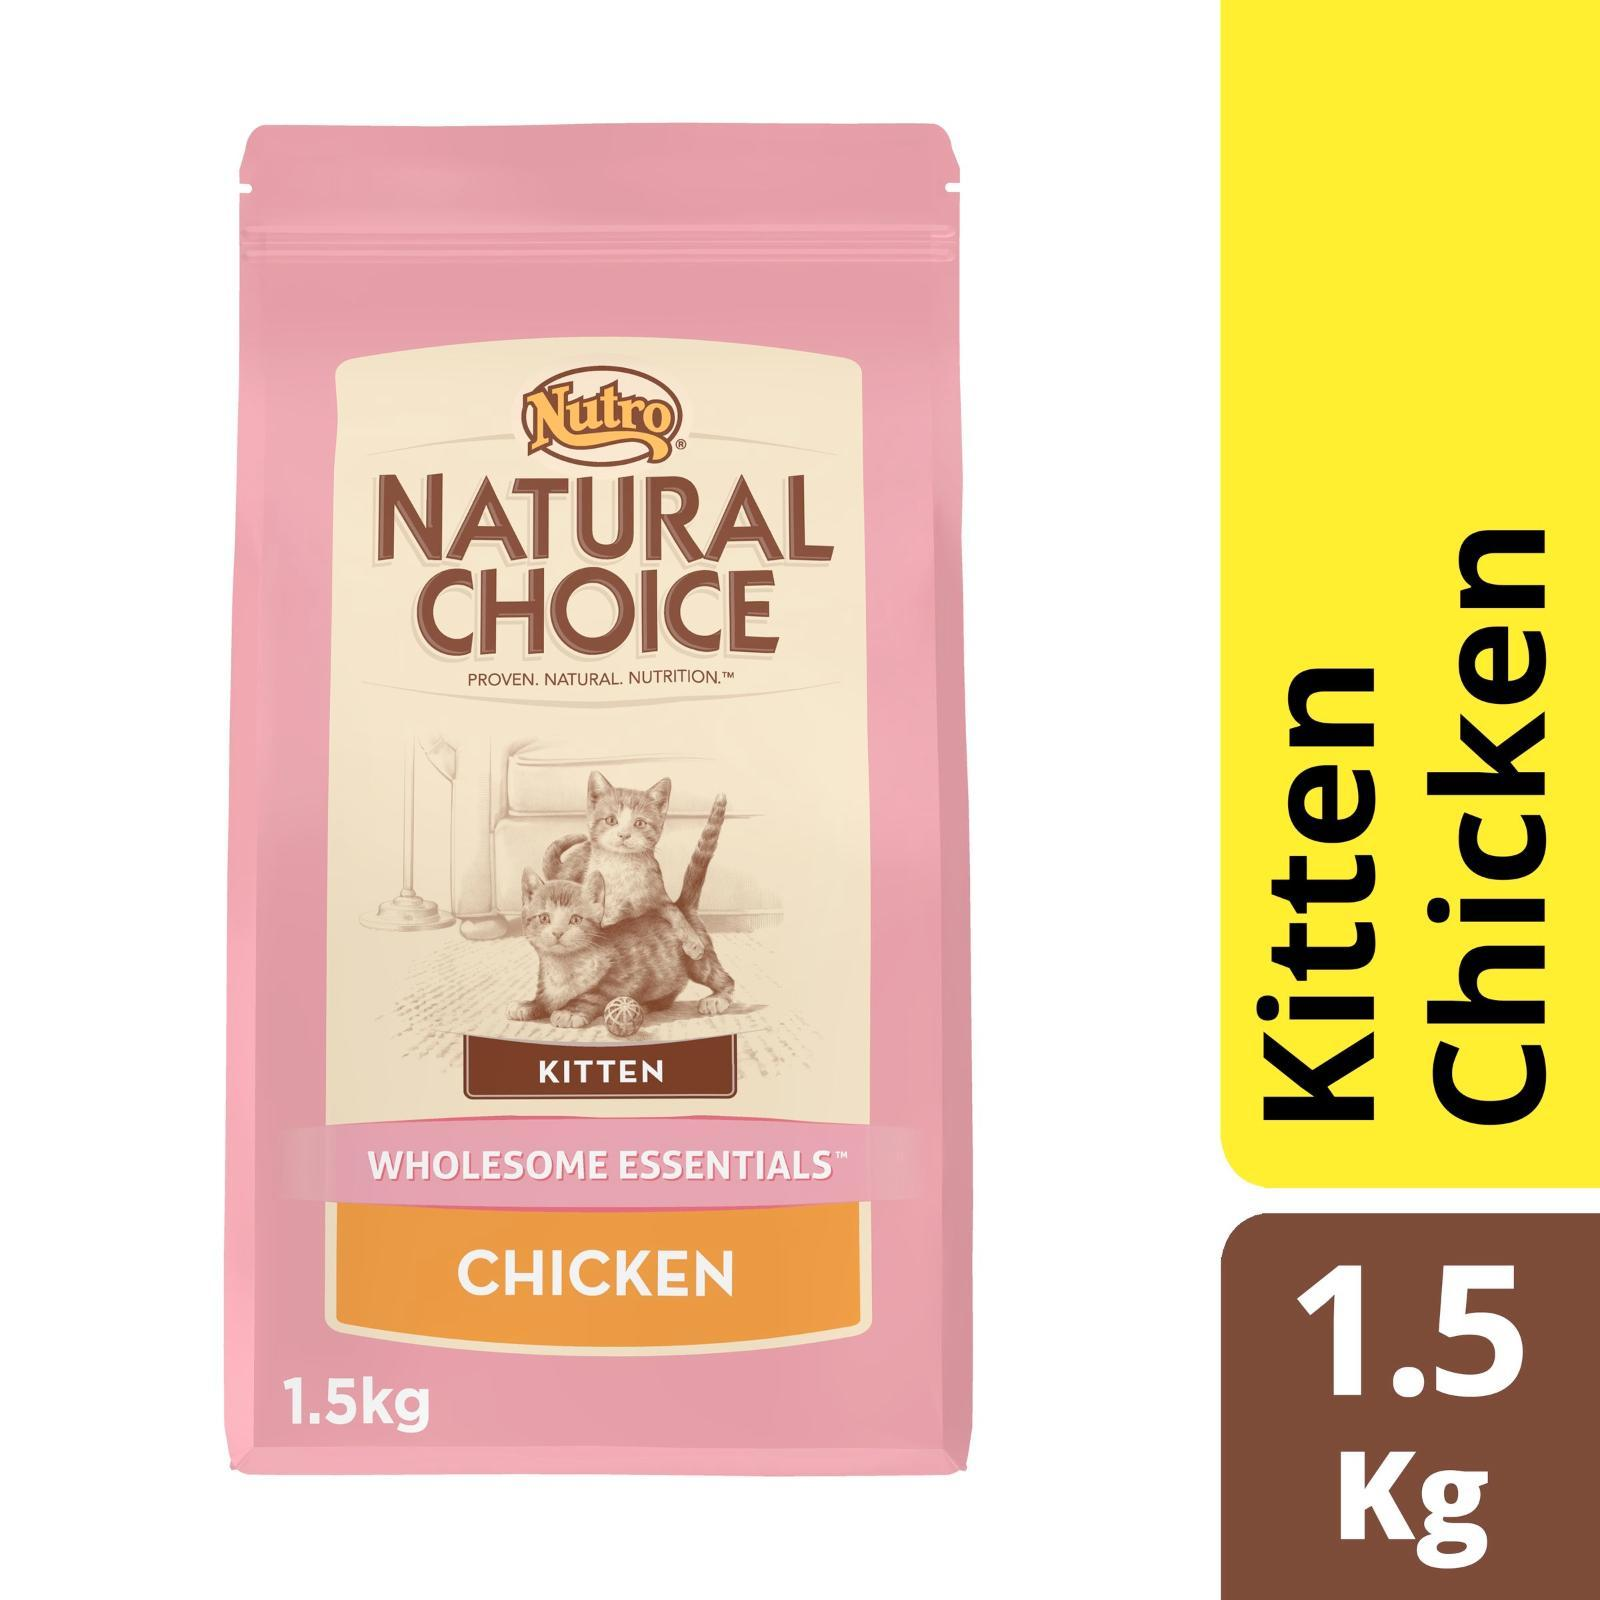 Nutro Cat Dry Kitten Wholeome Essential Chicken Cat Food